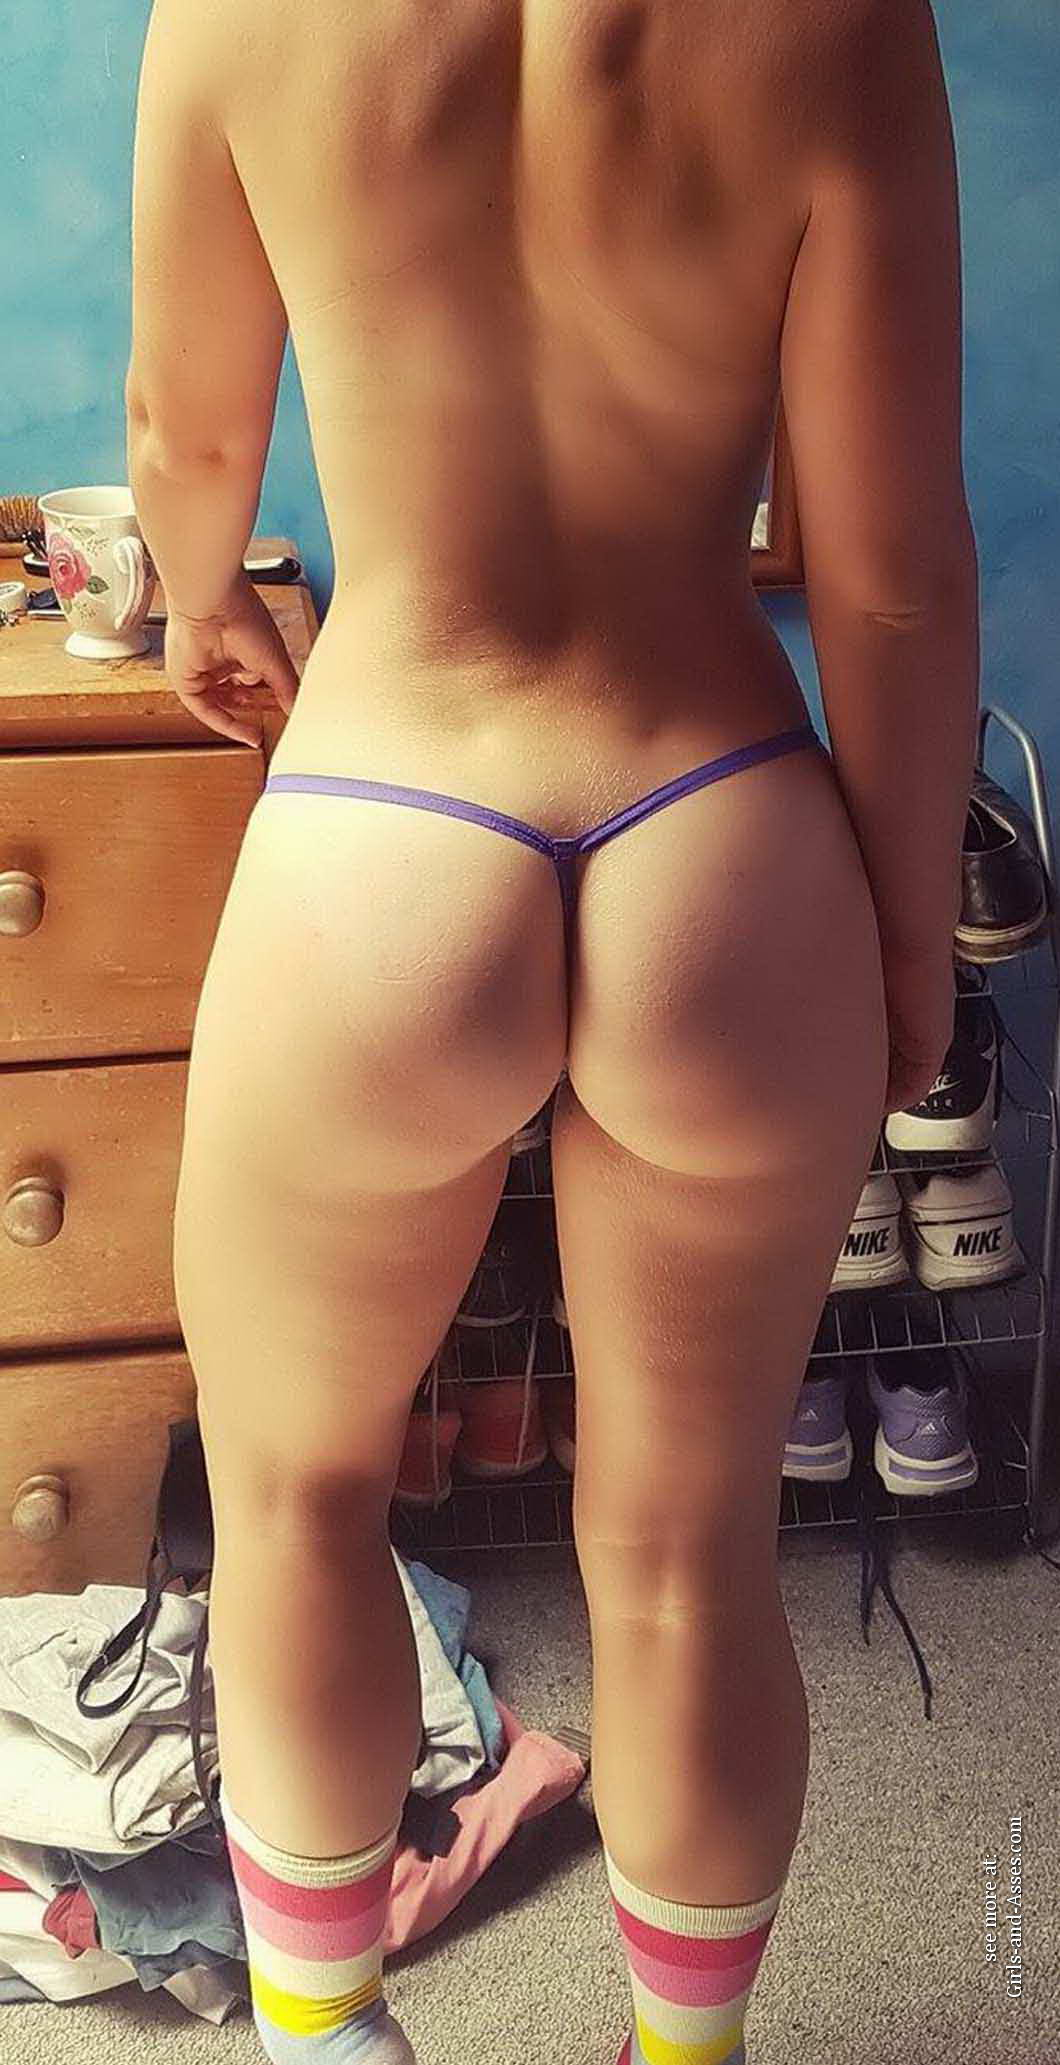 casual girls nude ass 01117